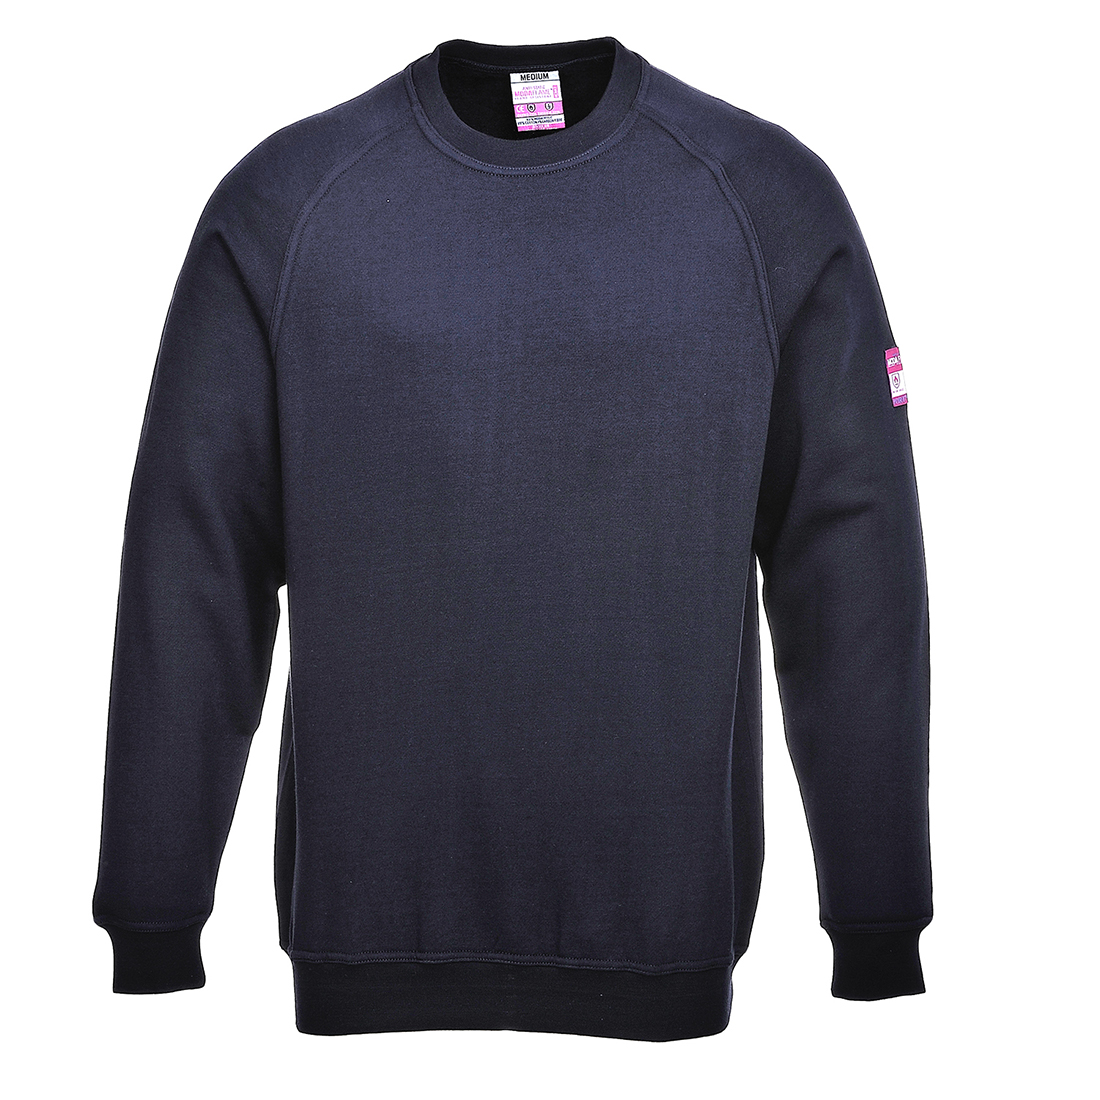 FR Antistatic Sweatshirt Navy XXXL